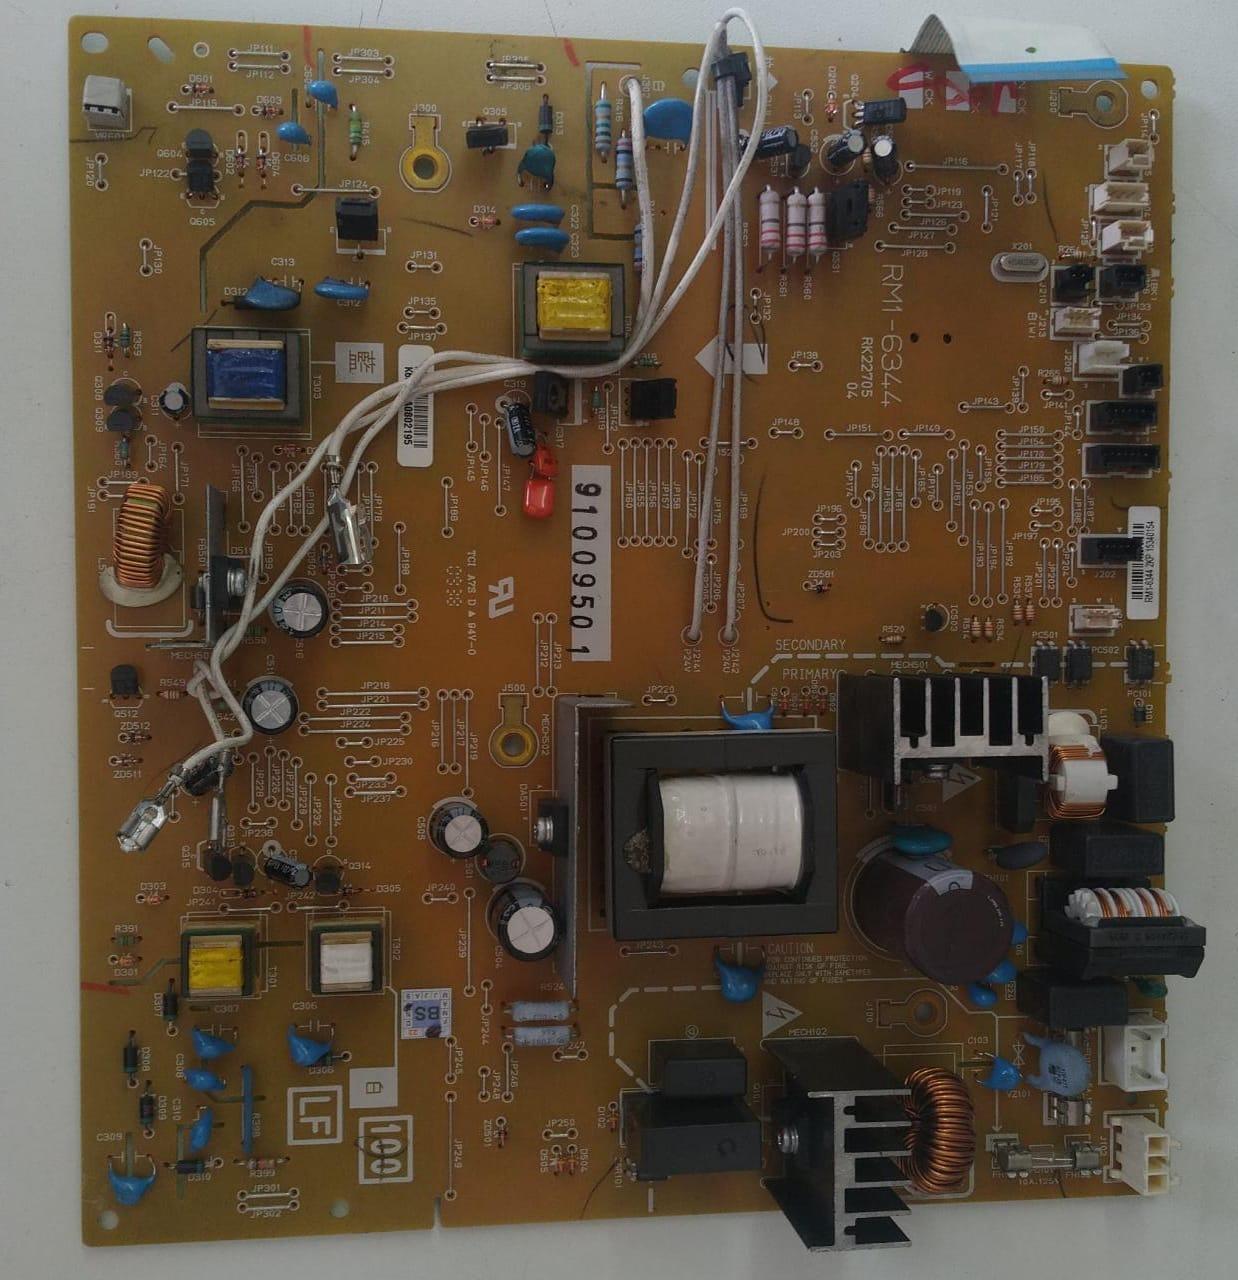 Placa Fonte Hp Laserjet P2035/2055  (RM1-6344)